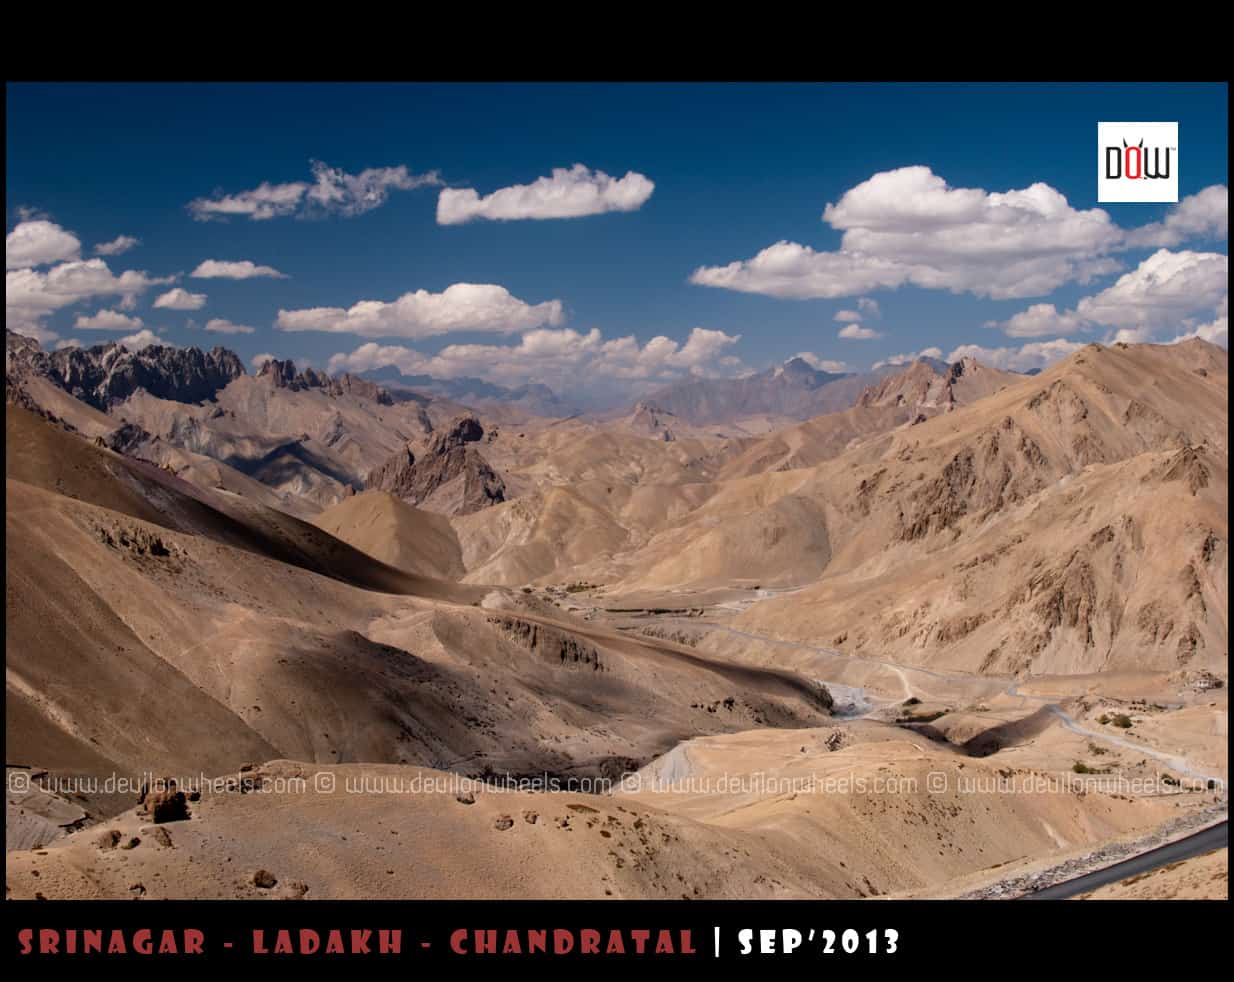 The Layers of Barren yet Beautiful Landscape on Srinagar - Leh Highway